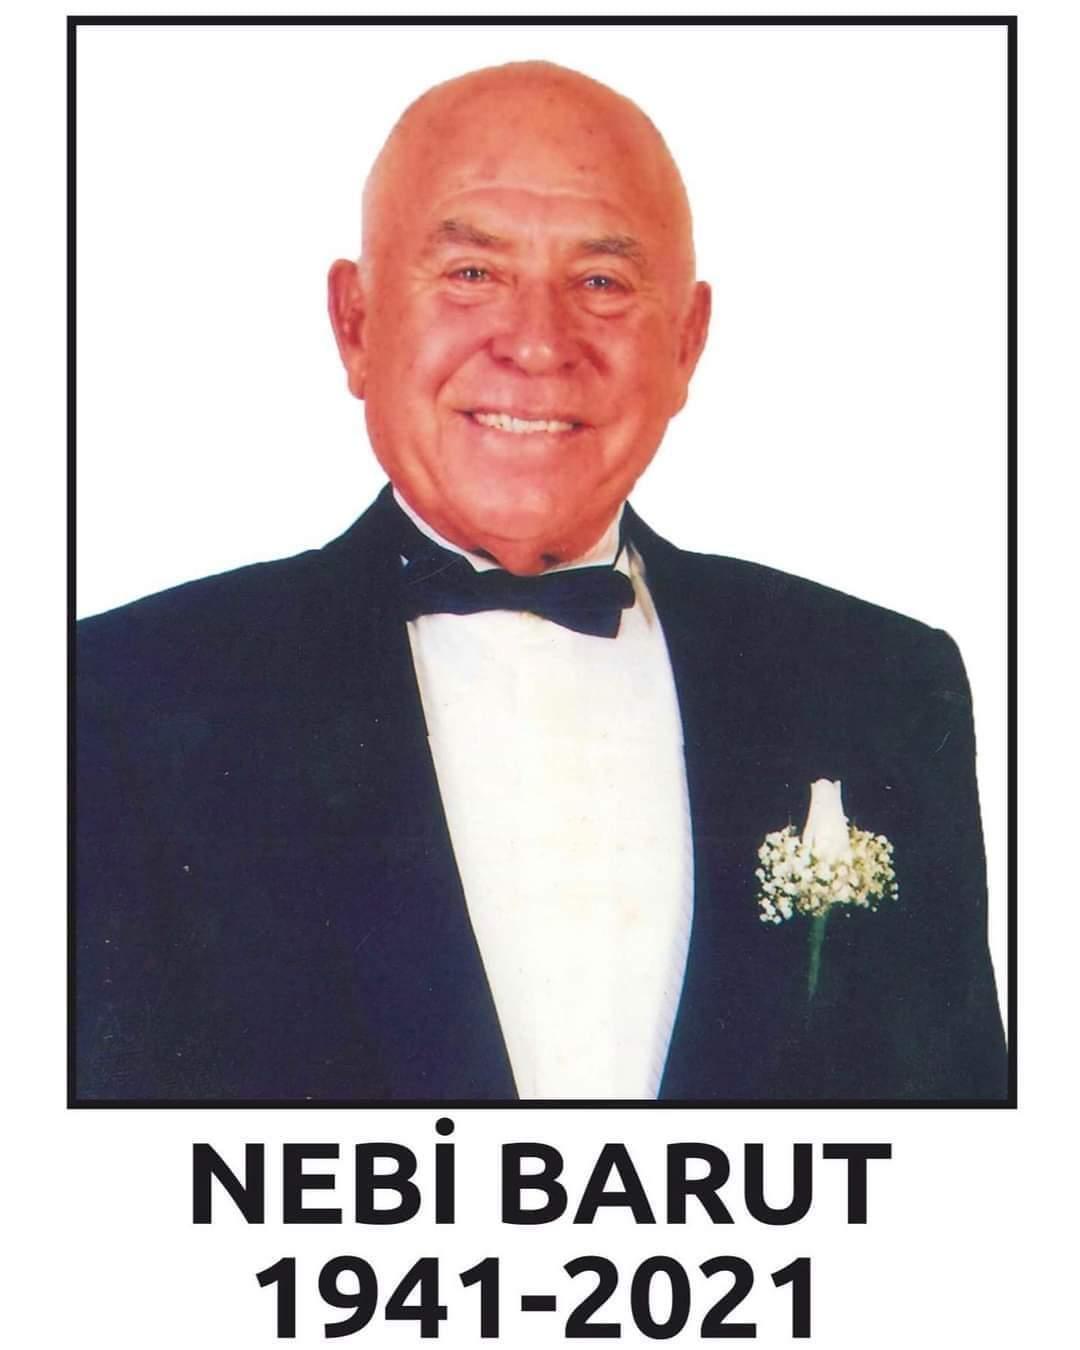 Barut otellerinin kurucusu Nebi Barut vefat etti